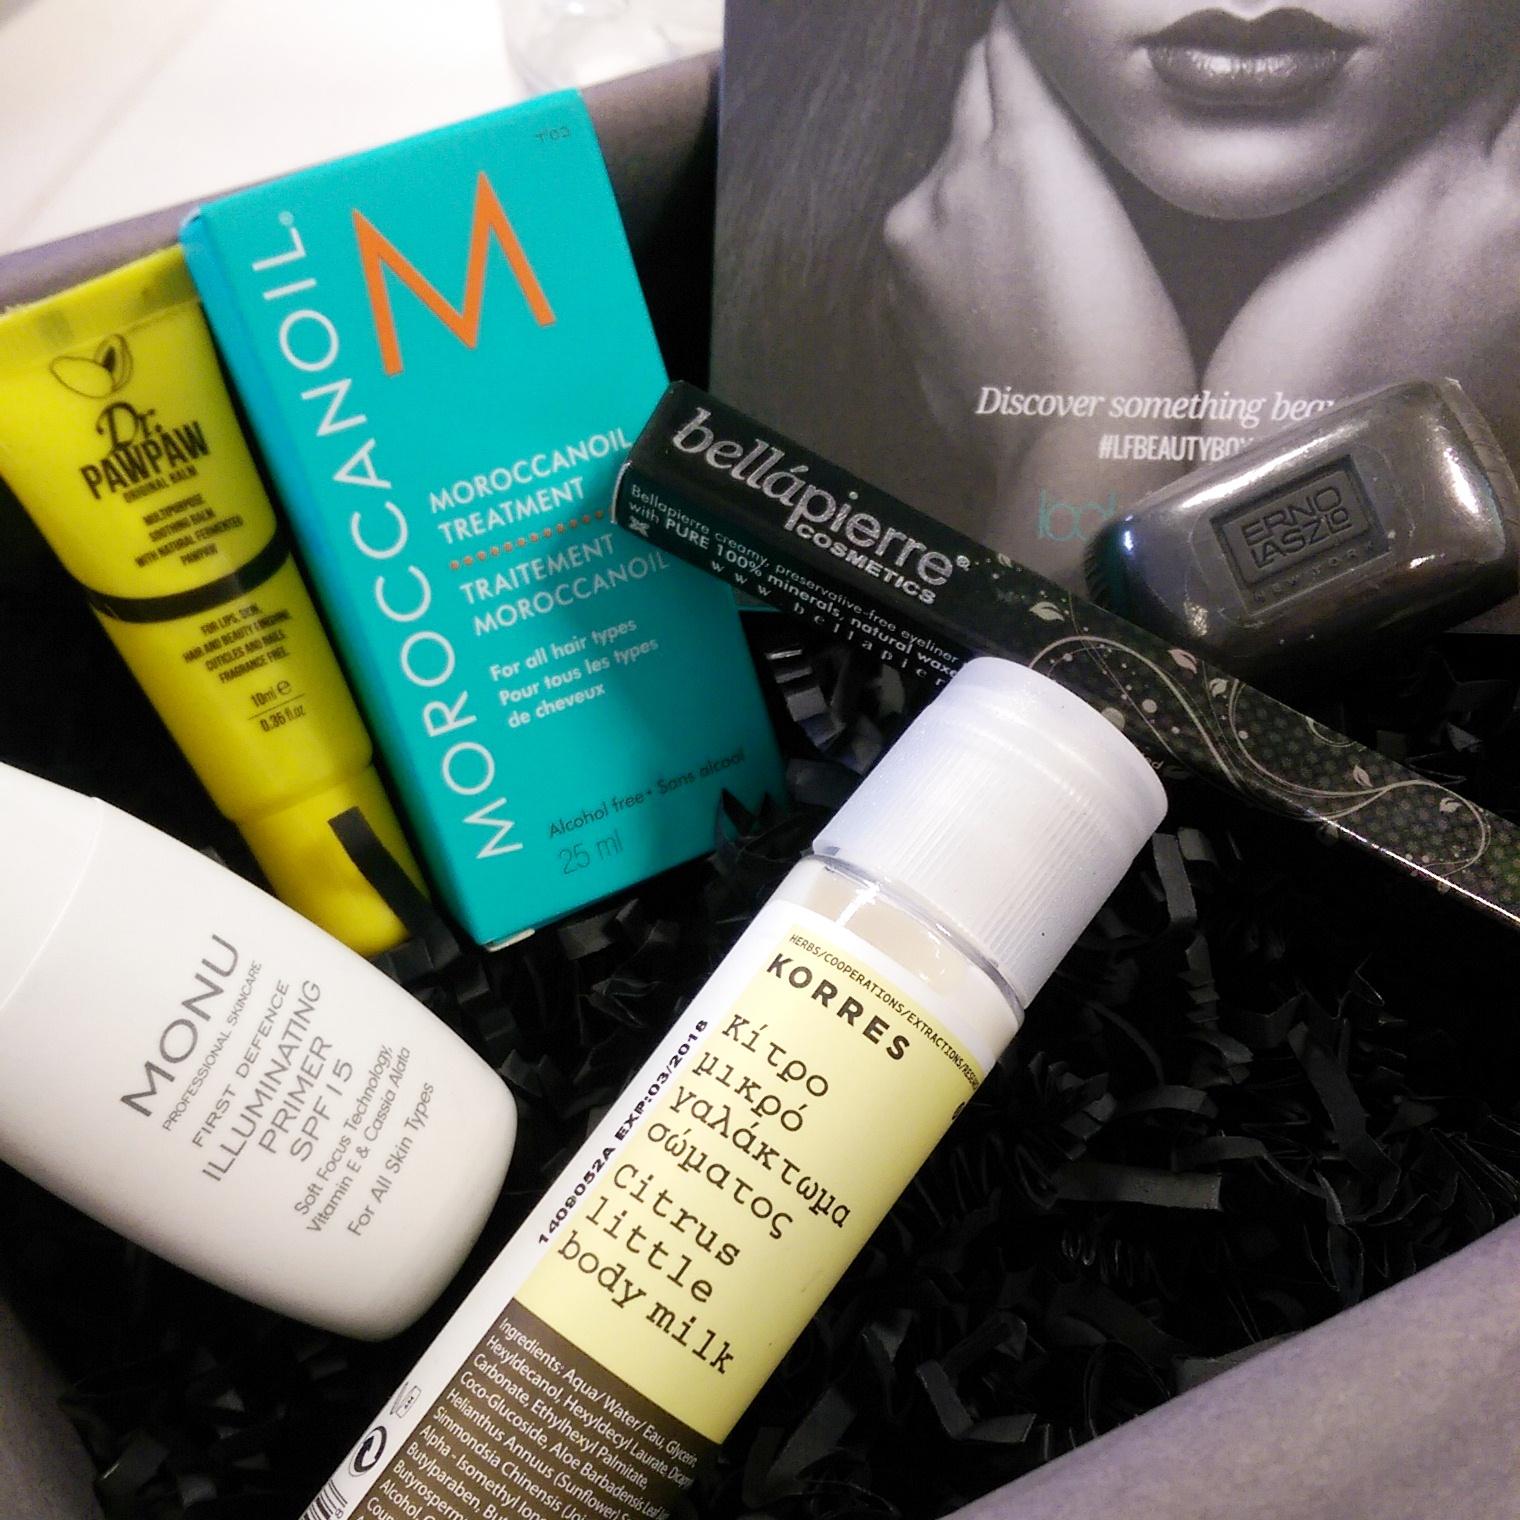 The Look Fantastic February Beauty box on UK beauty blog, Hello Terri Lowe.